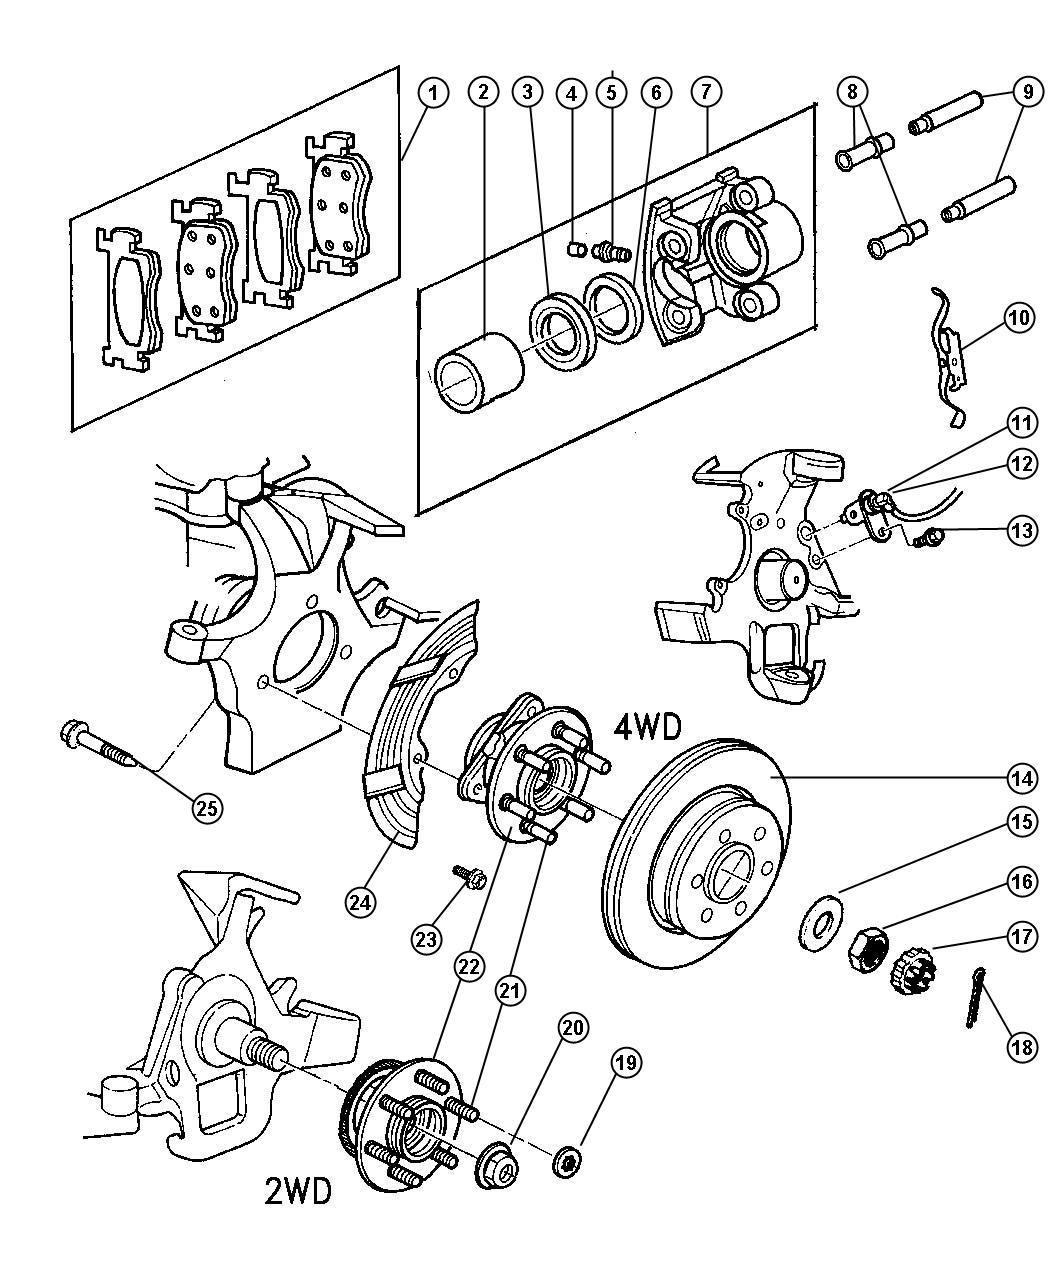 Dodge Ram 4x4 Front Axle Diagram